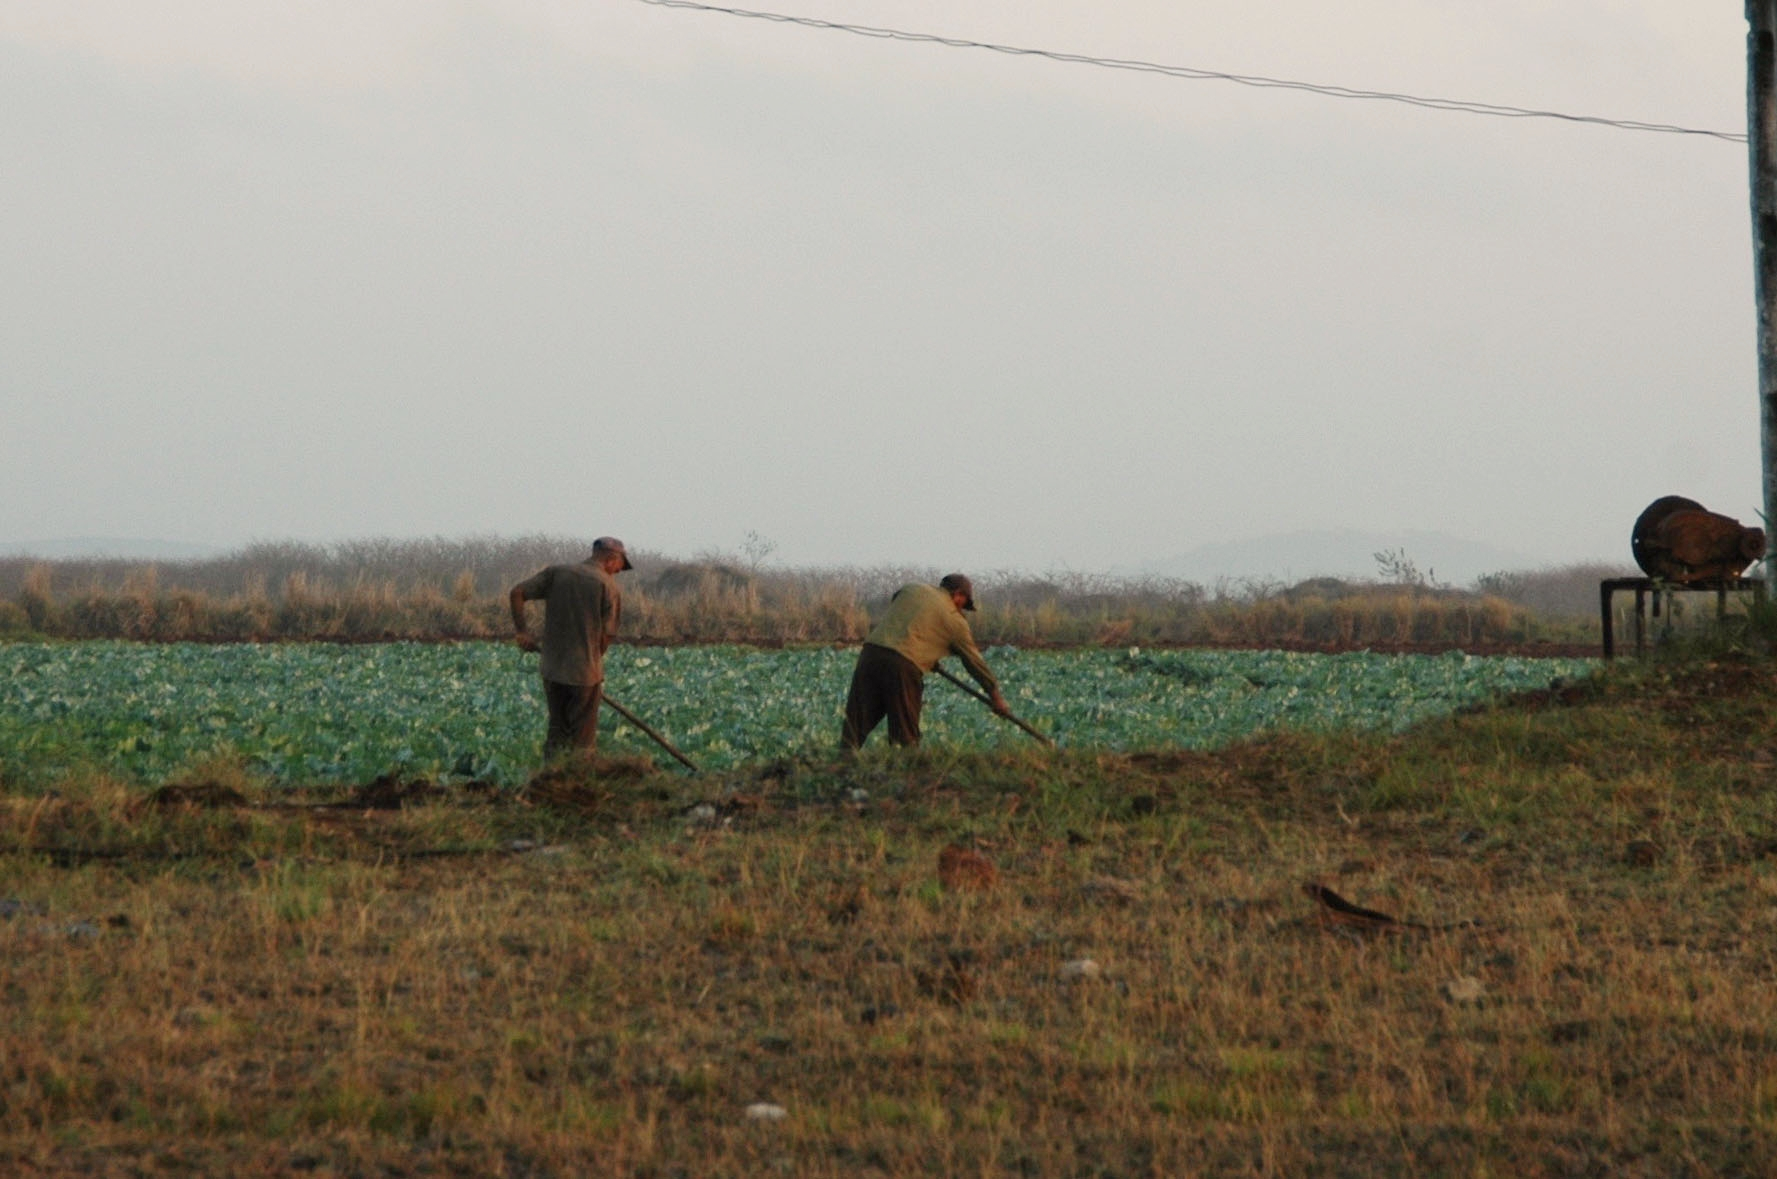 Tending the fields